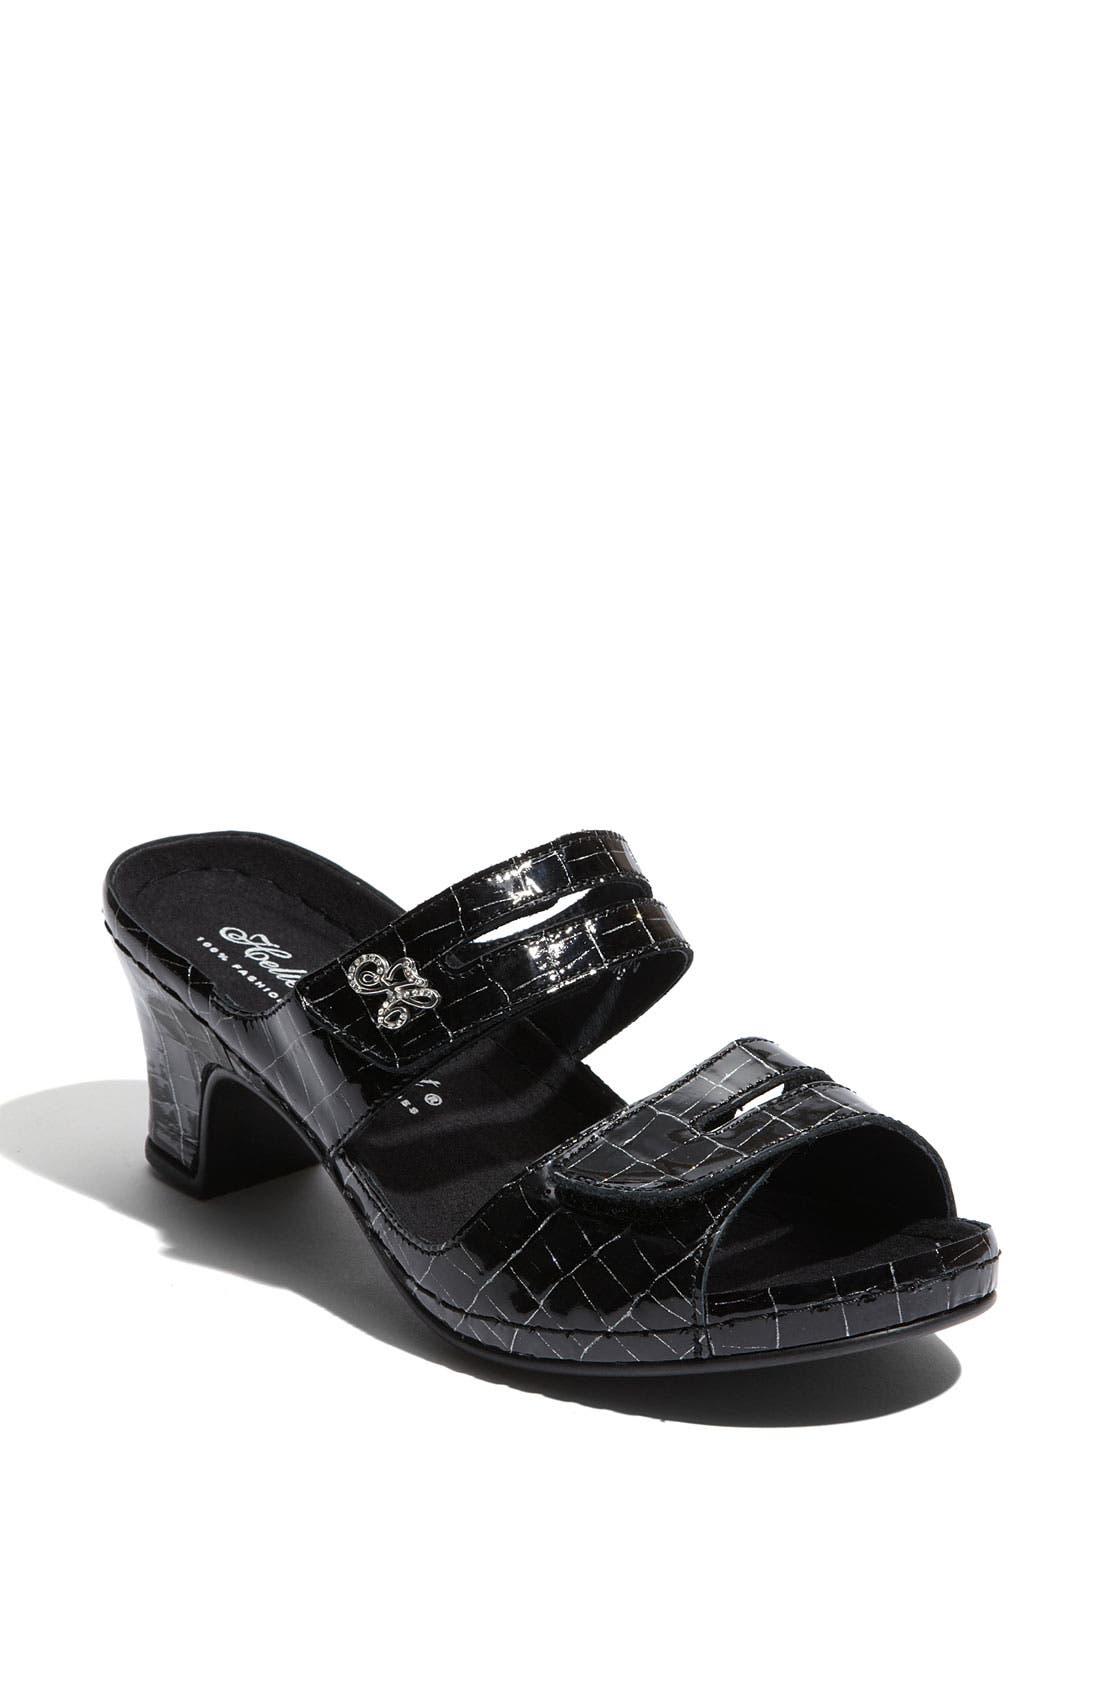 Main Image - Helle Comfort® 'Dena' Sandal